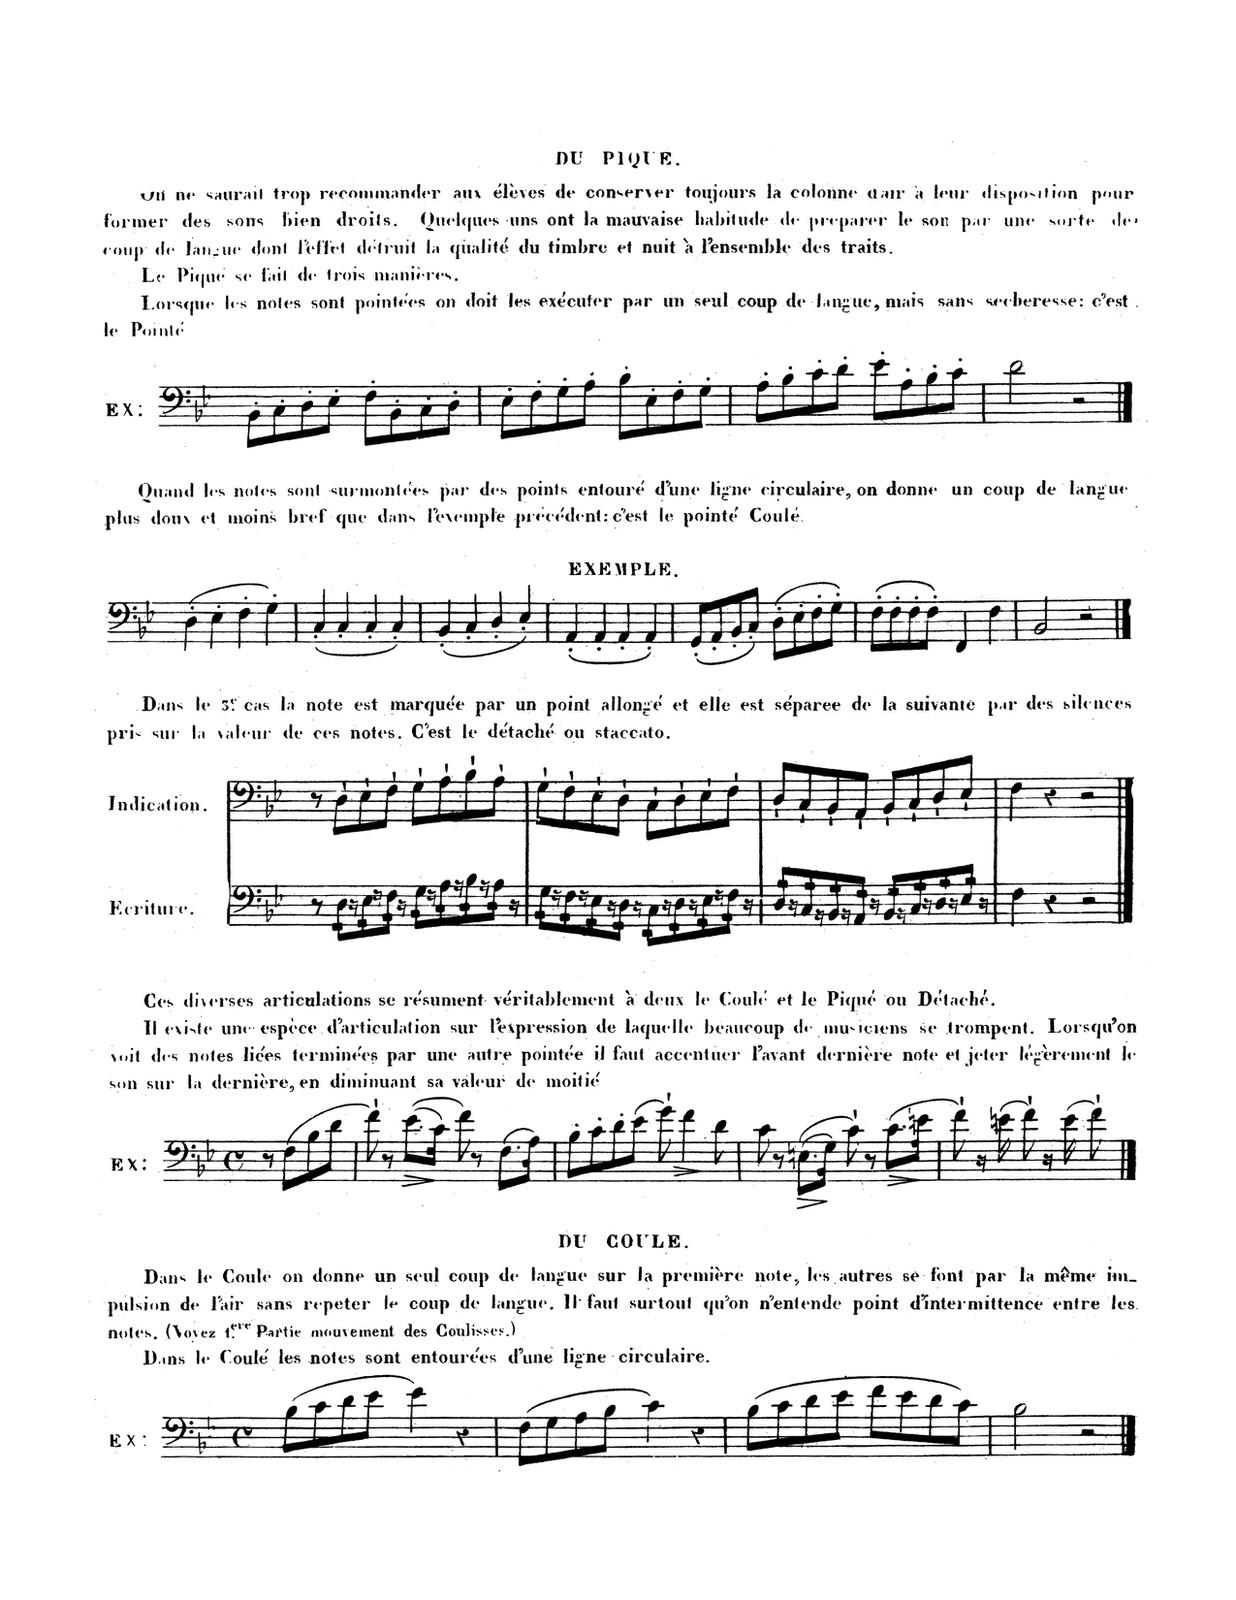 Berr & Dieppo, Methode Complete de Trombone a Coulisse 5